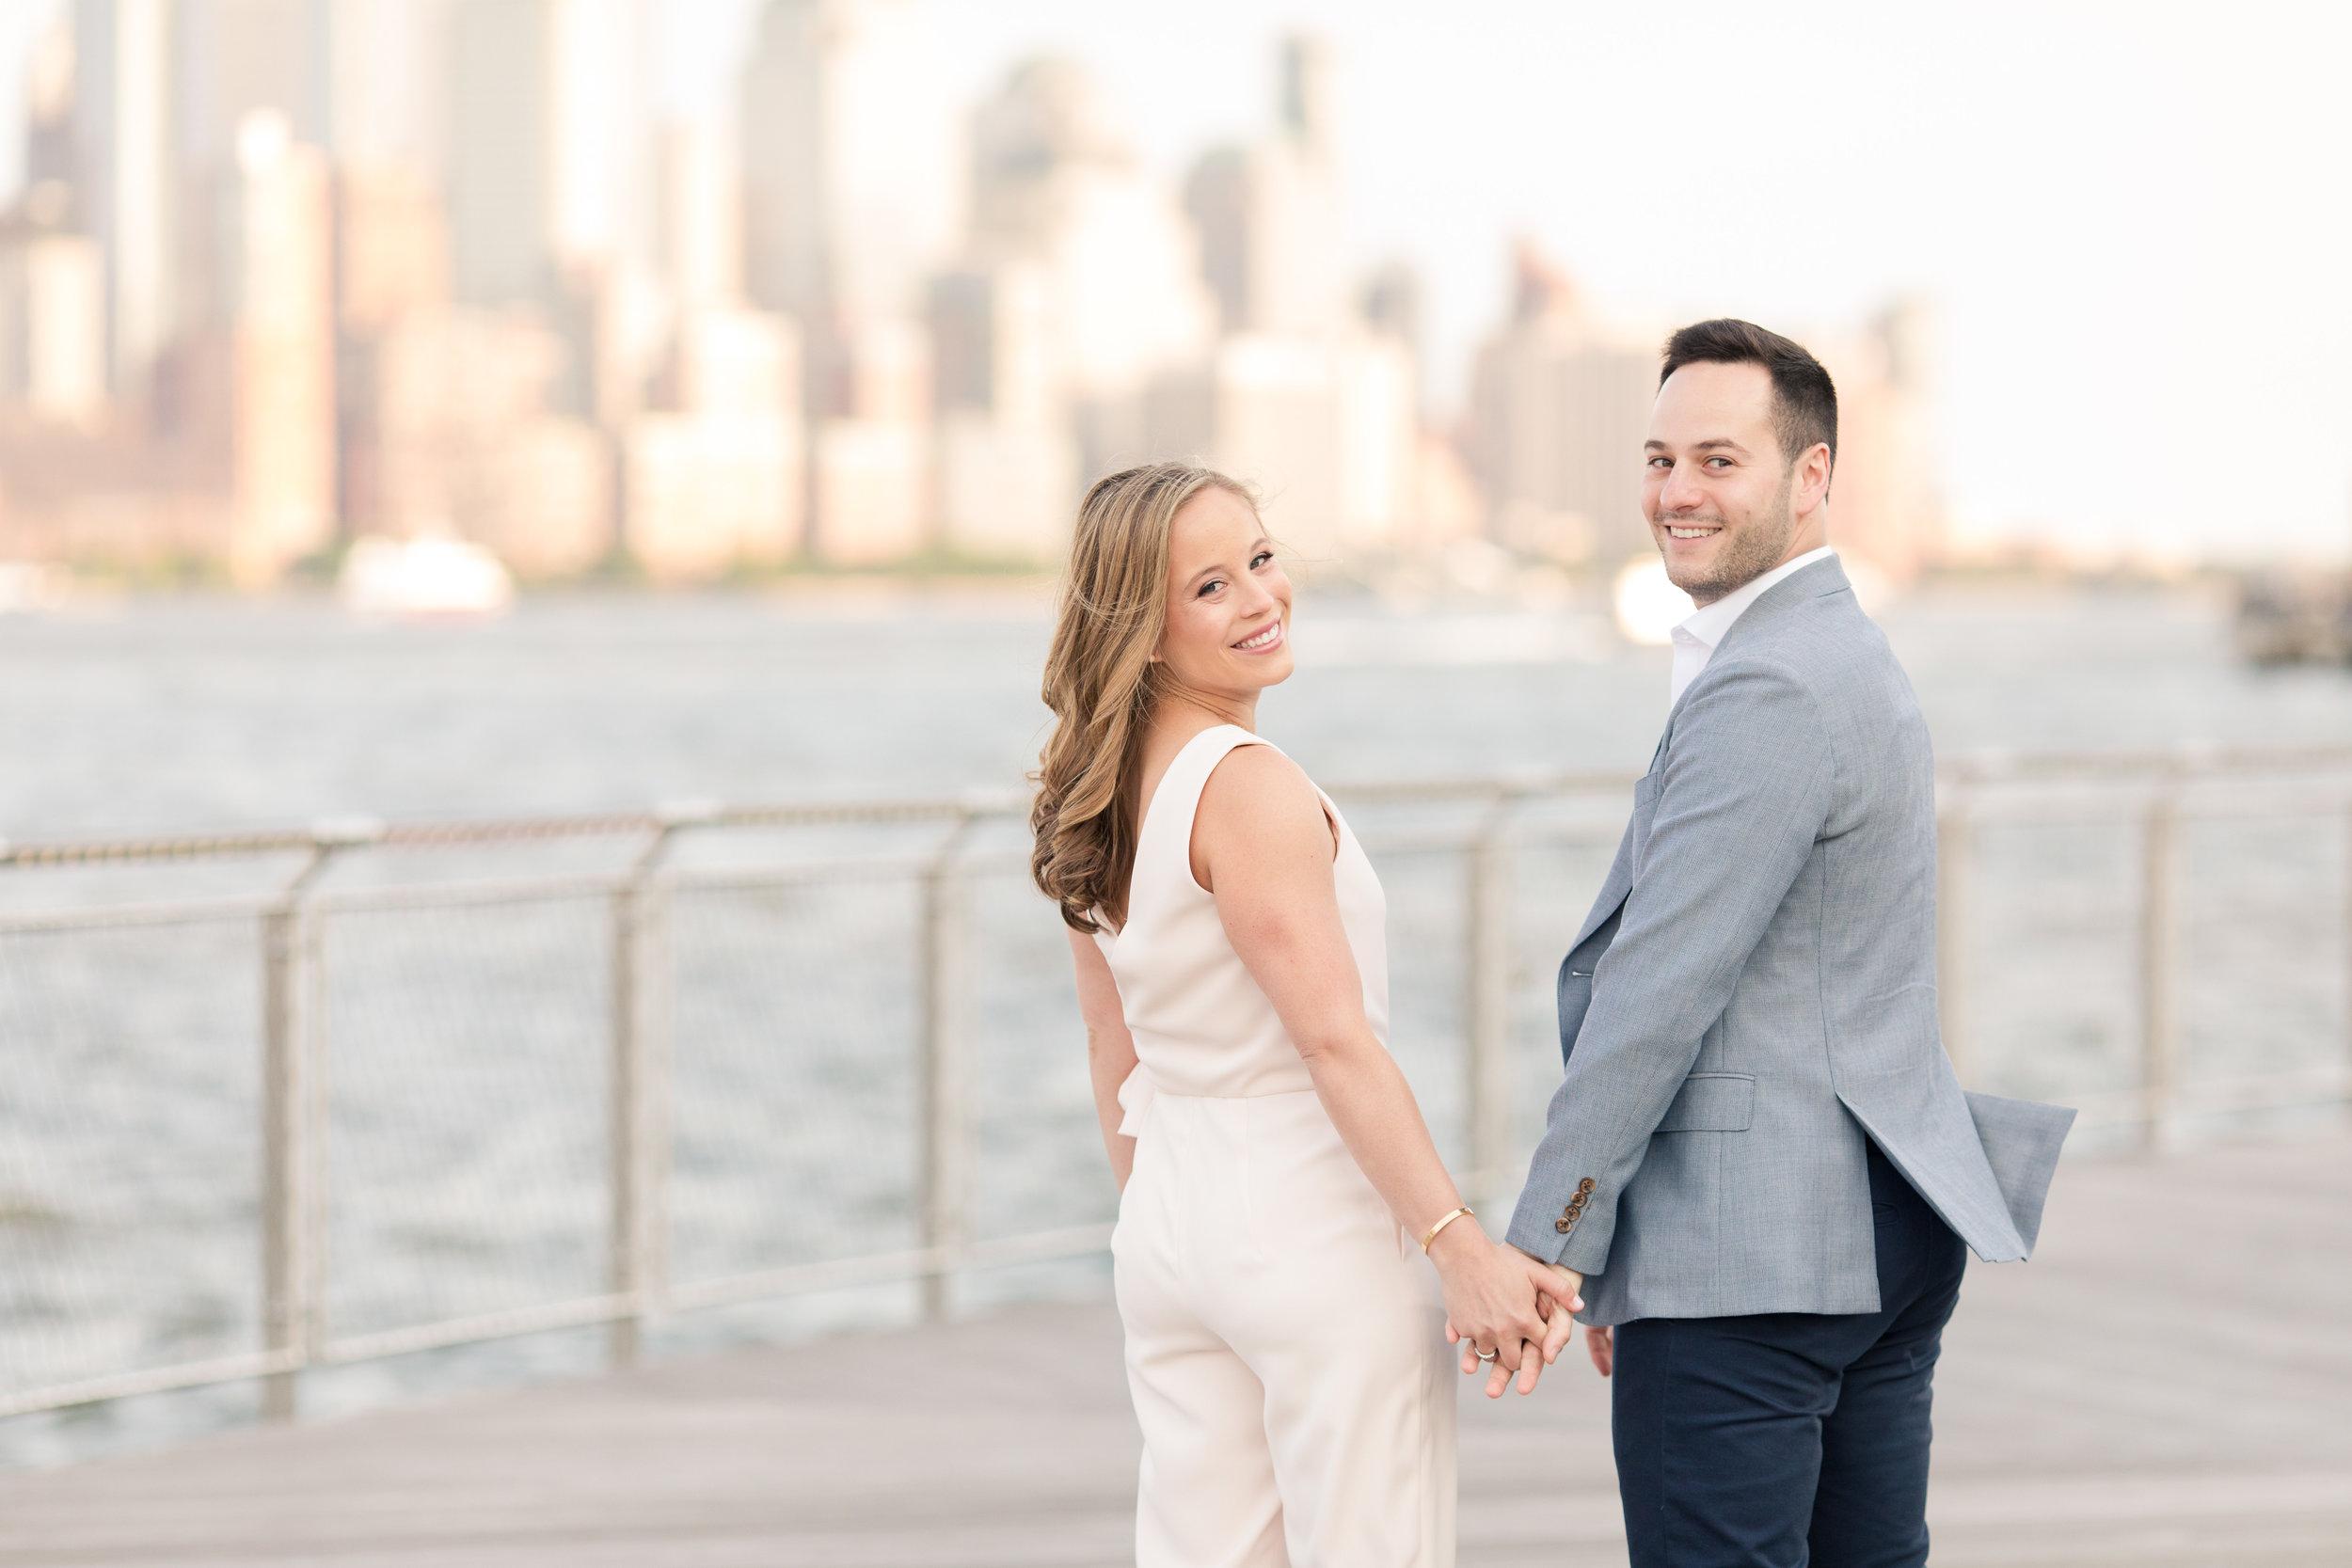 Alyssa & Al, Hoboken Engagement, May 2018